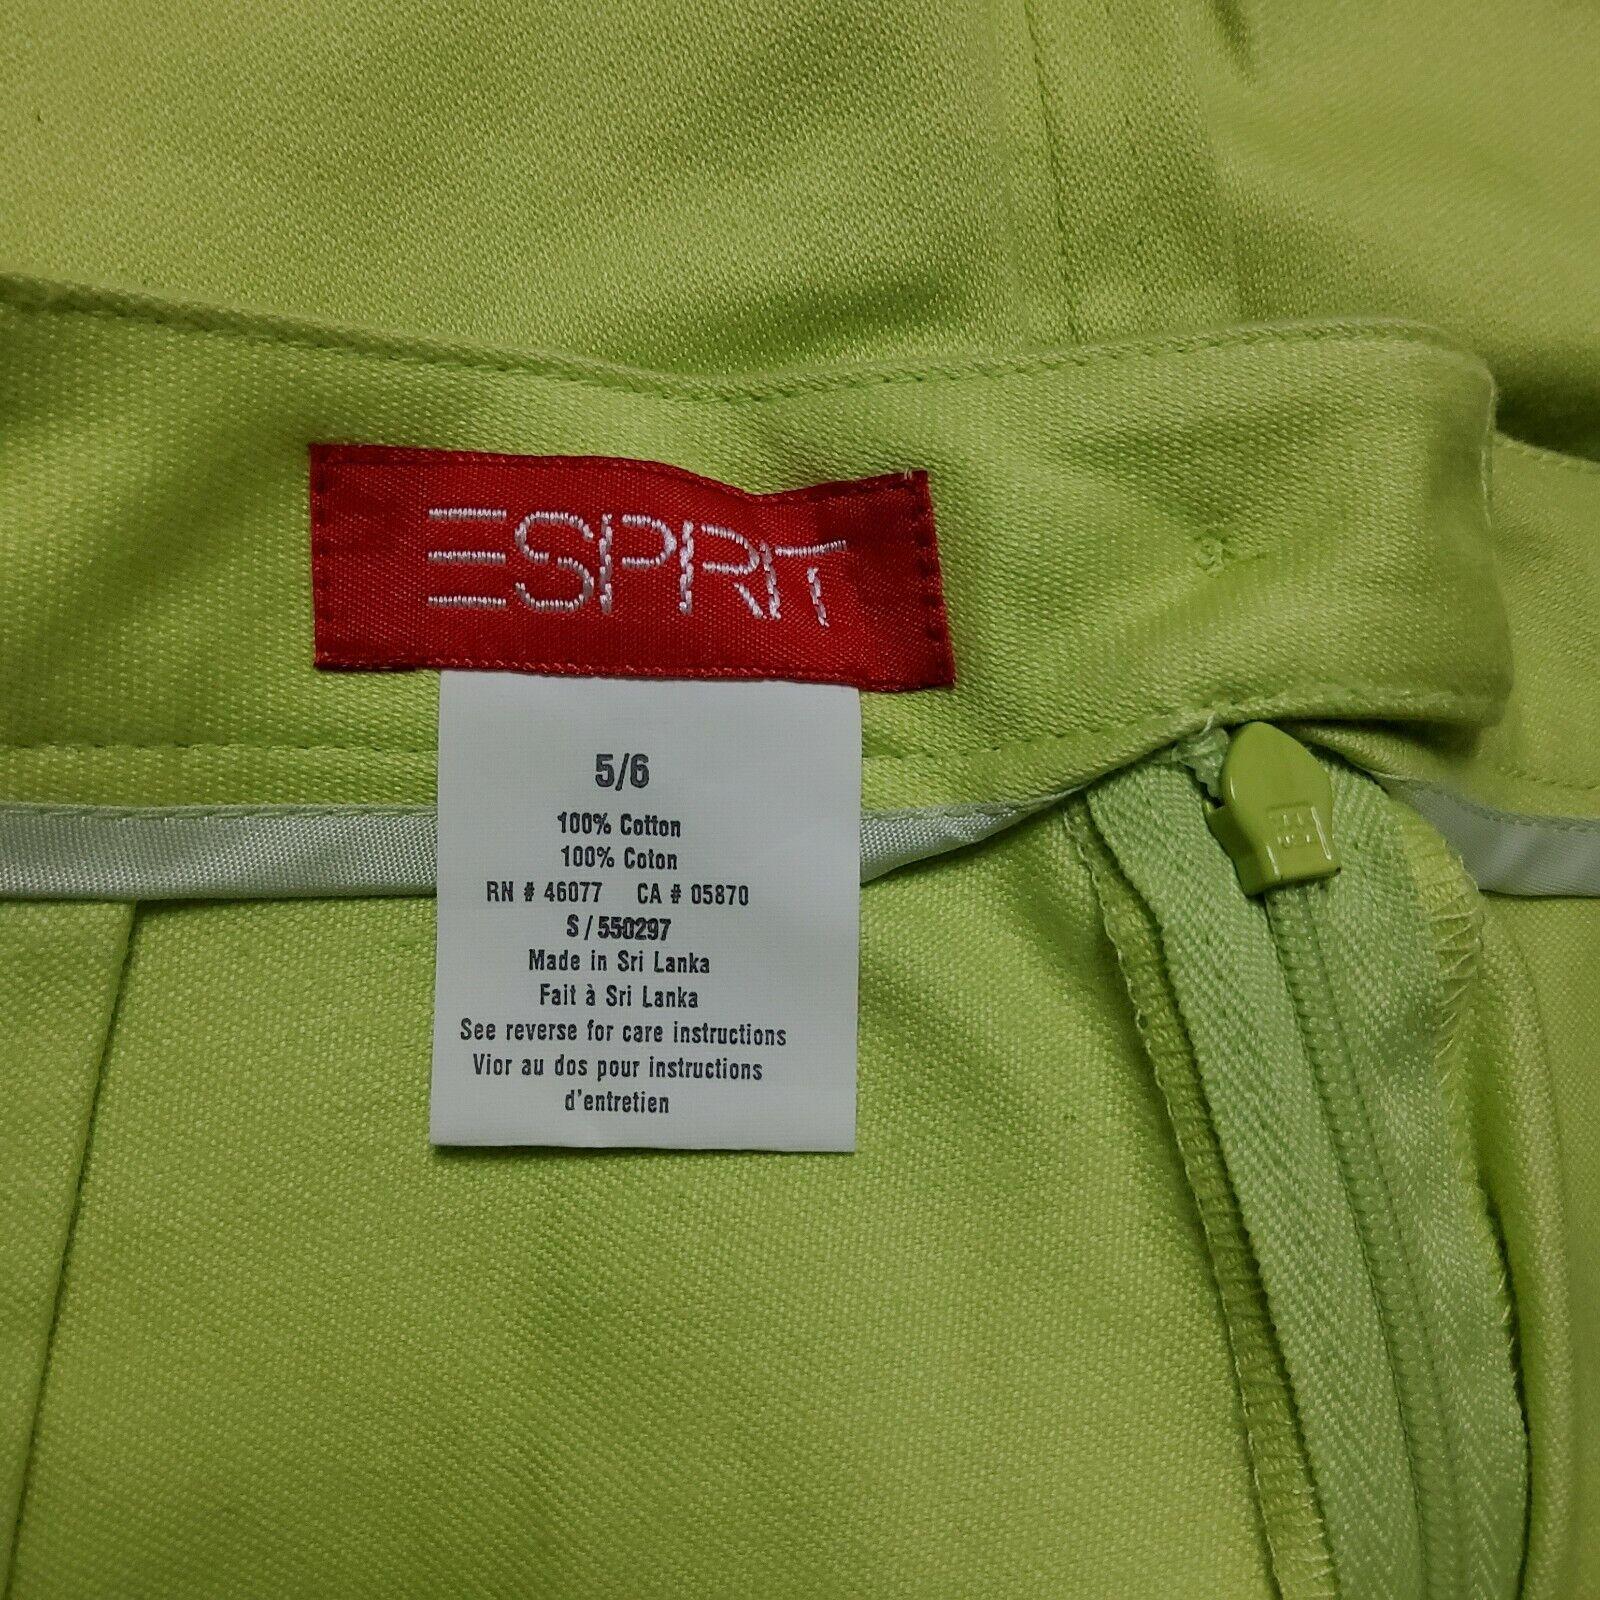 Esprit Neon Green Skirt - image 5